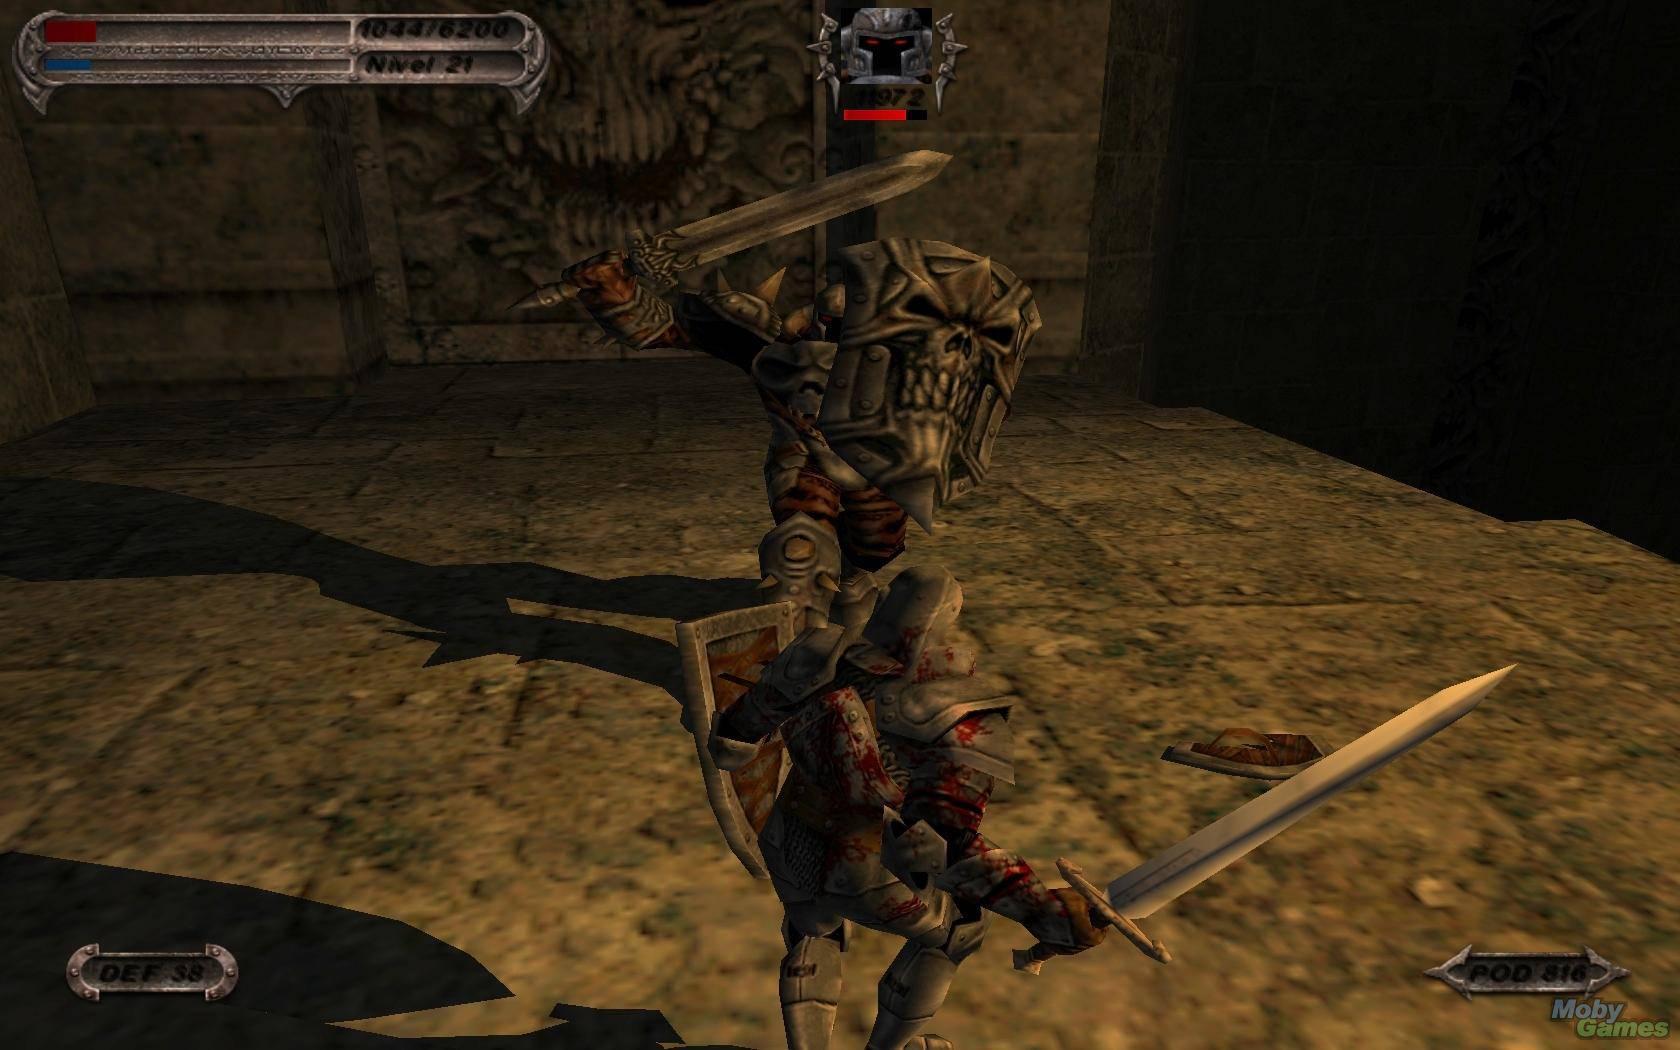 Severance: Blade of Darkness Captura 2